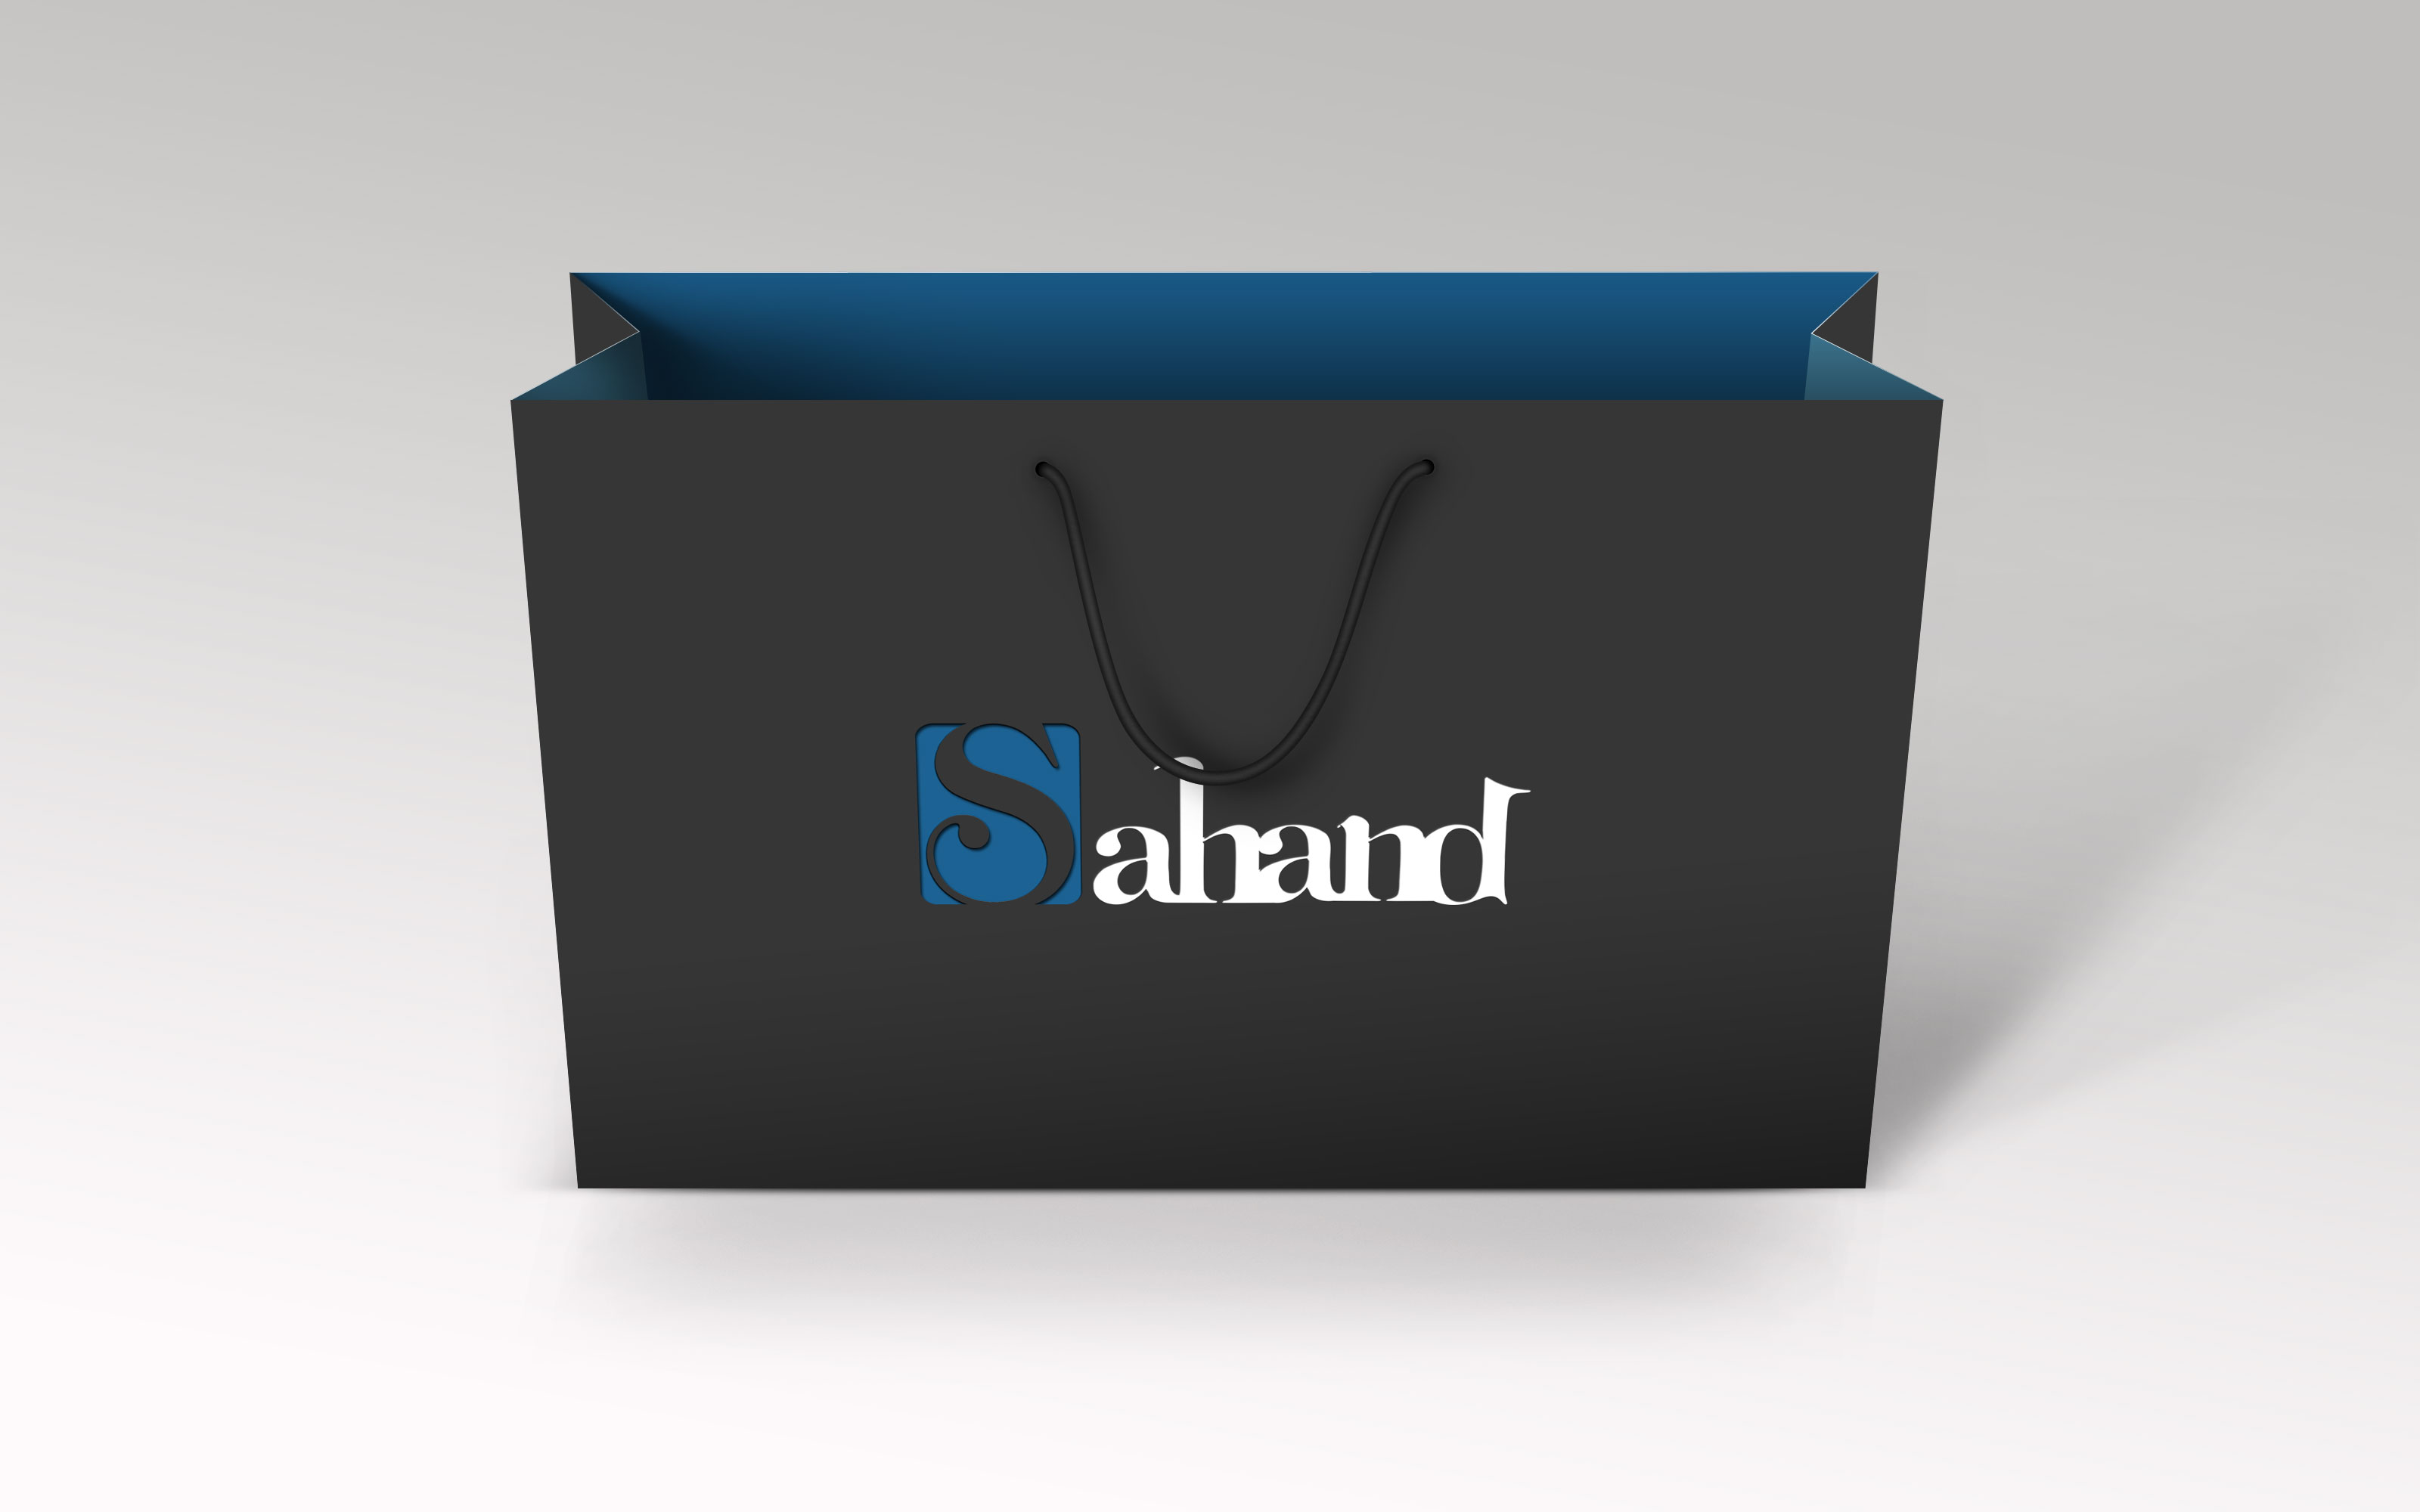 http://nahidfazeli.persiangig.com/image/sahand-logo-shopping-bag.jpg